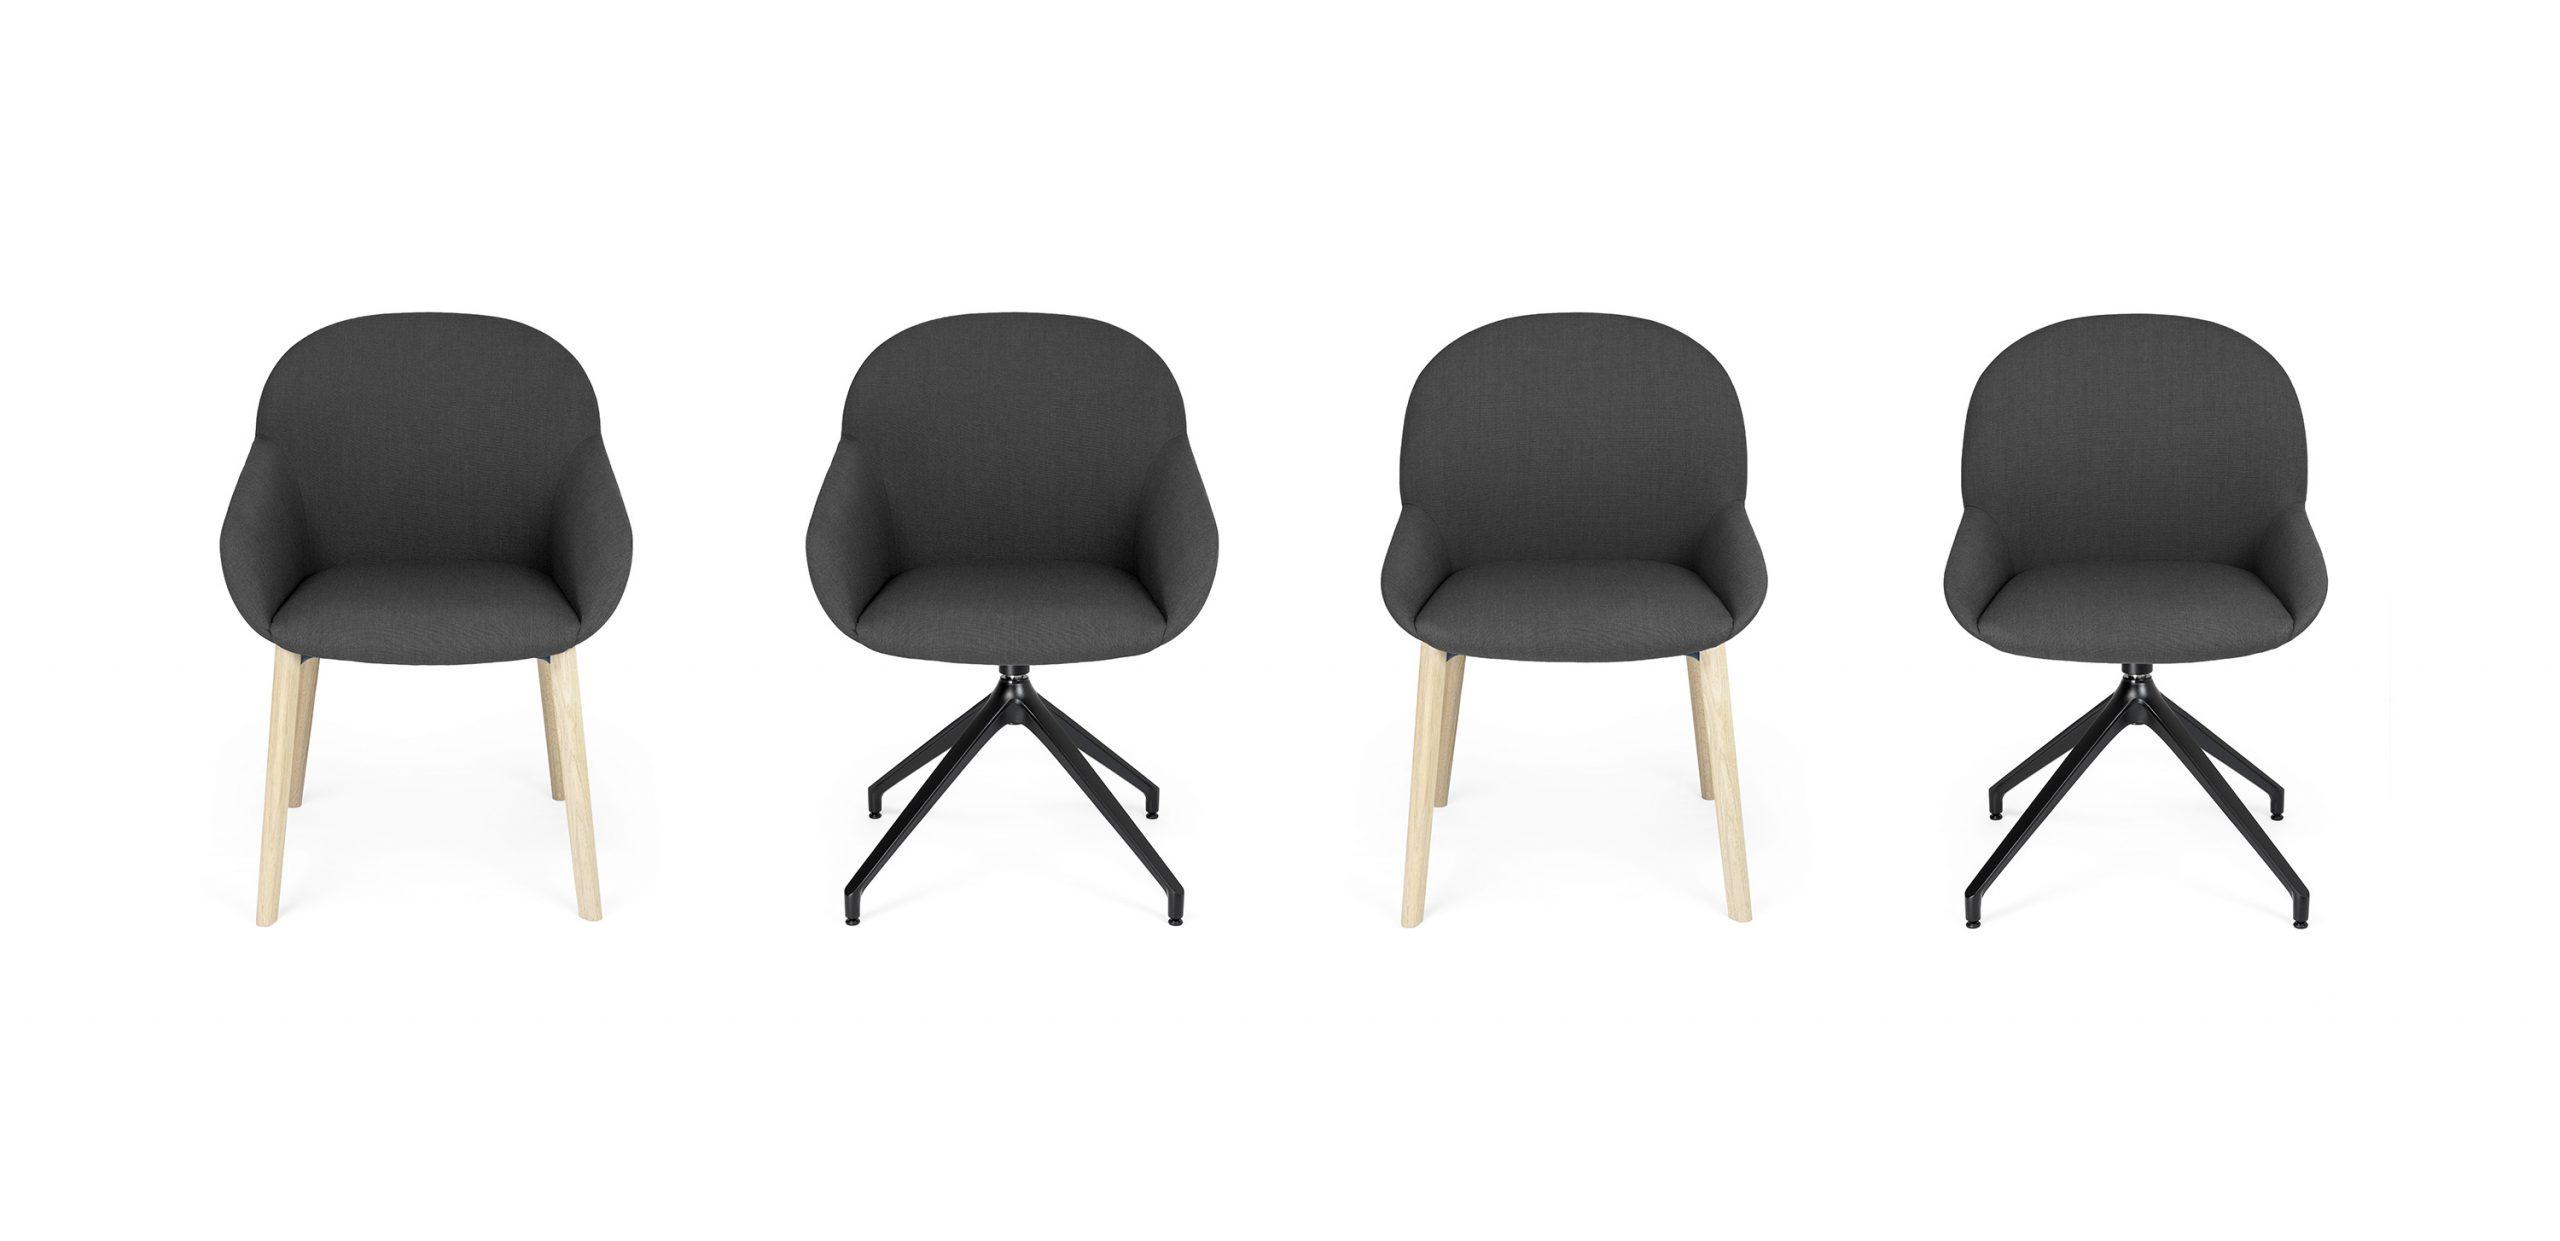 Elba chairs by Debiasi Sandri for Crassevig overview